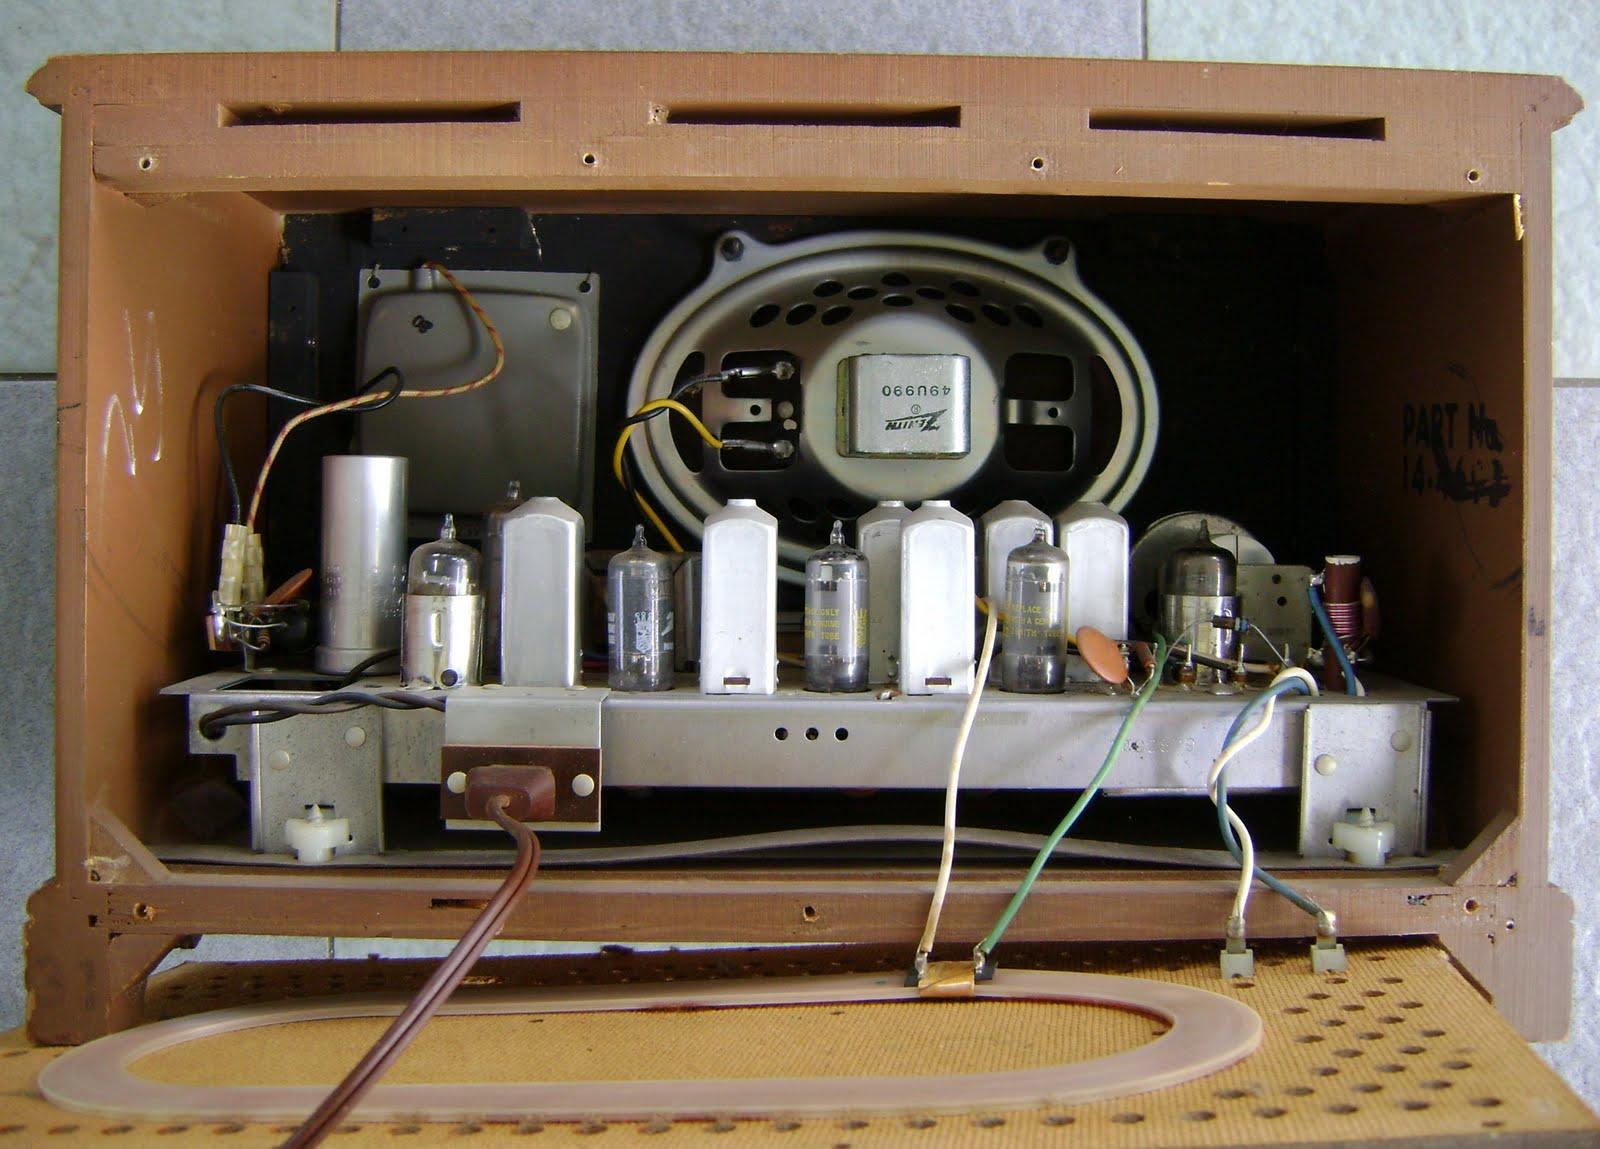 Kinta Valley Audio Zenith Model K731 Tube Radio Used Sold. Zenith Model K731 Tube Radio Used Sold. Wiring. Zenith Tube Radio Schematics Model 6s At Scoala.co